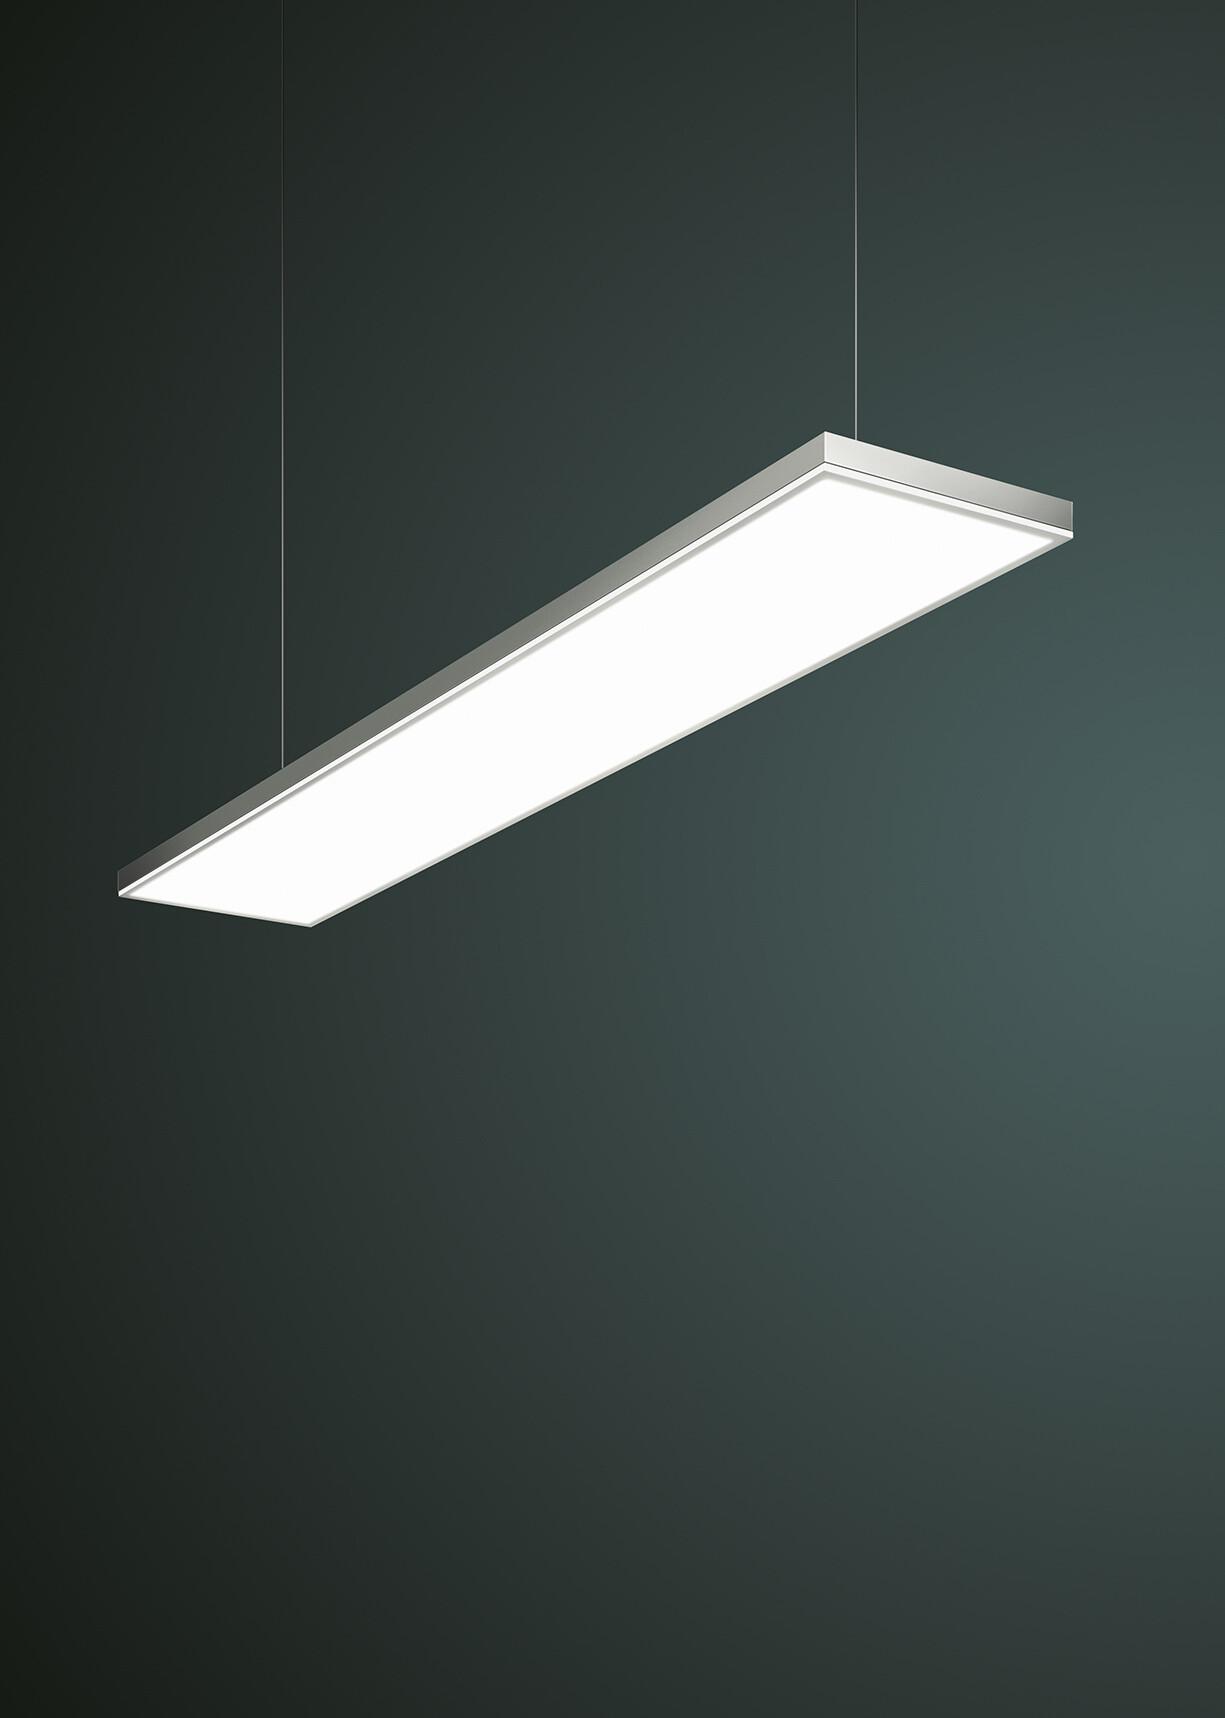 instalight Flat 2040